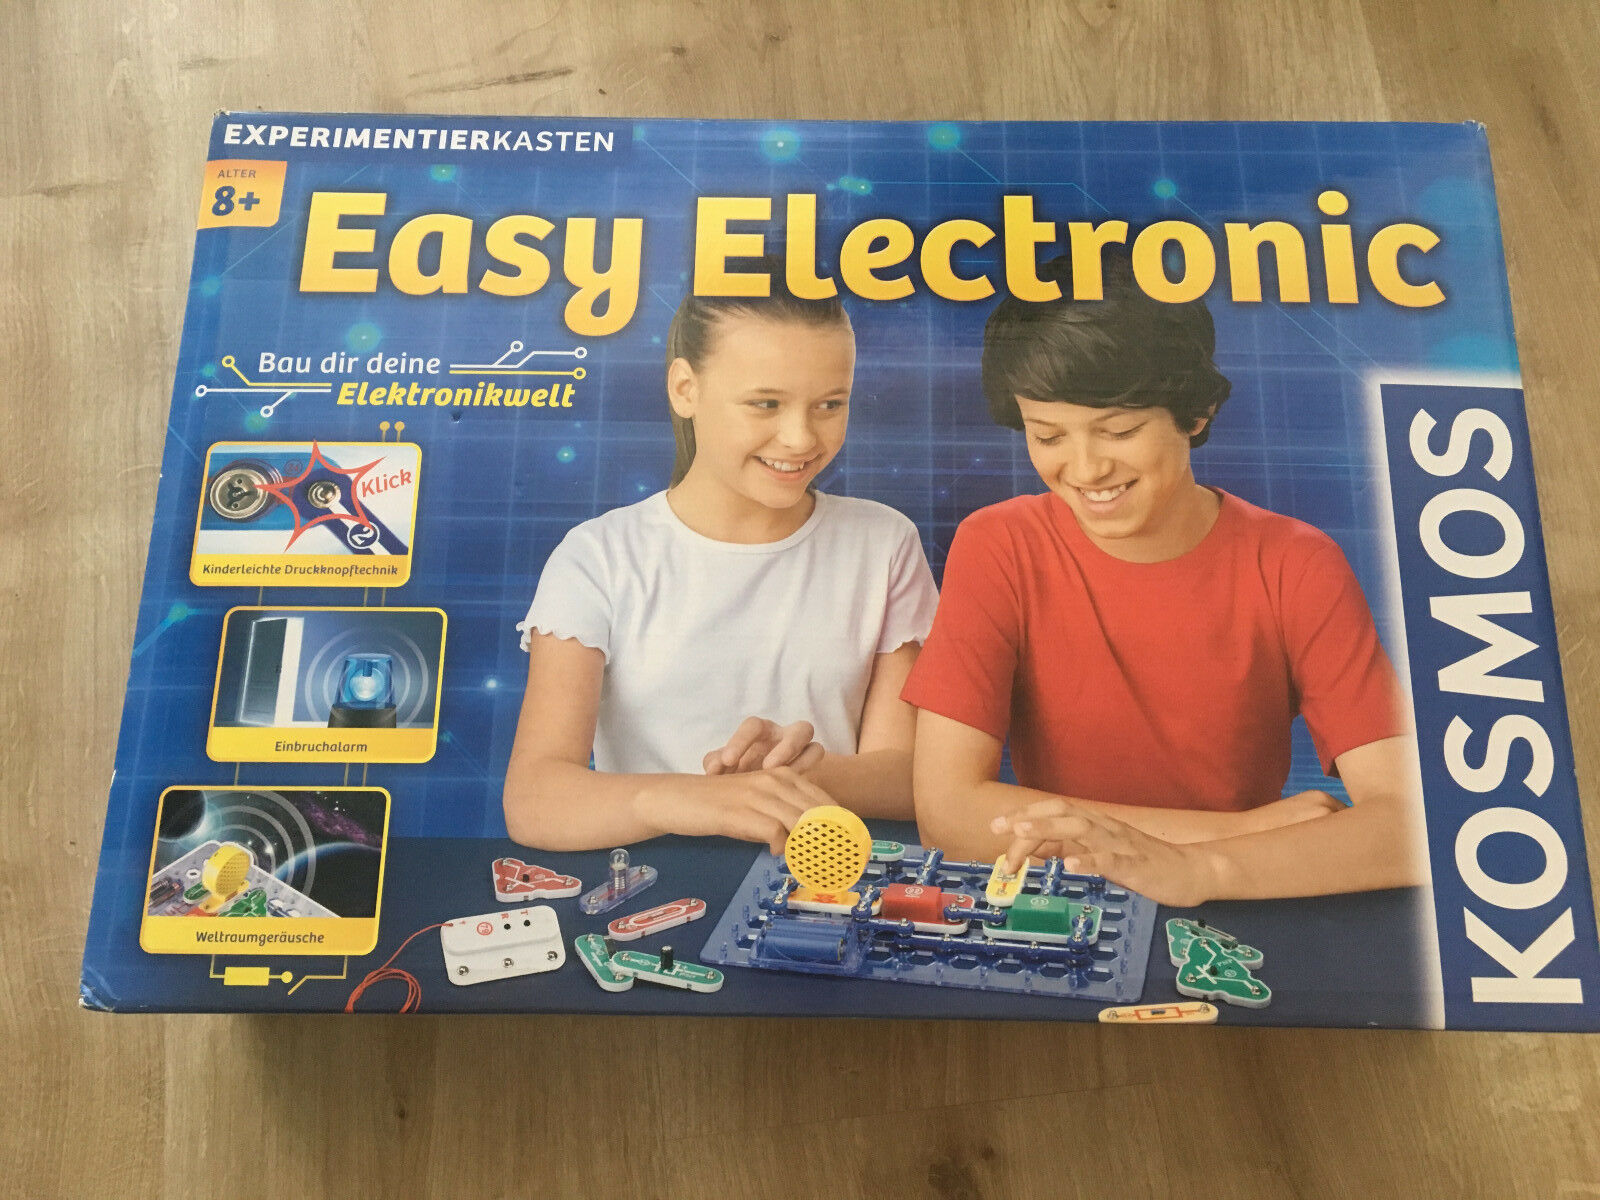 KOSMOS Easy Electronic Experimentierkasten 8+ / Elektronik Baukasten